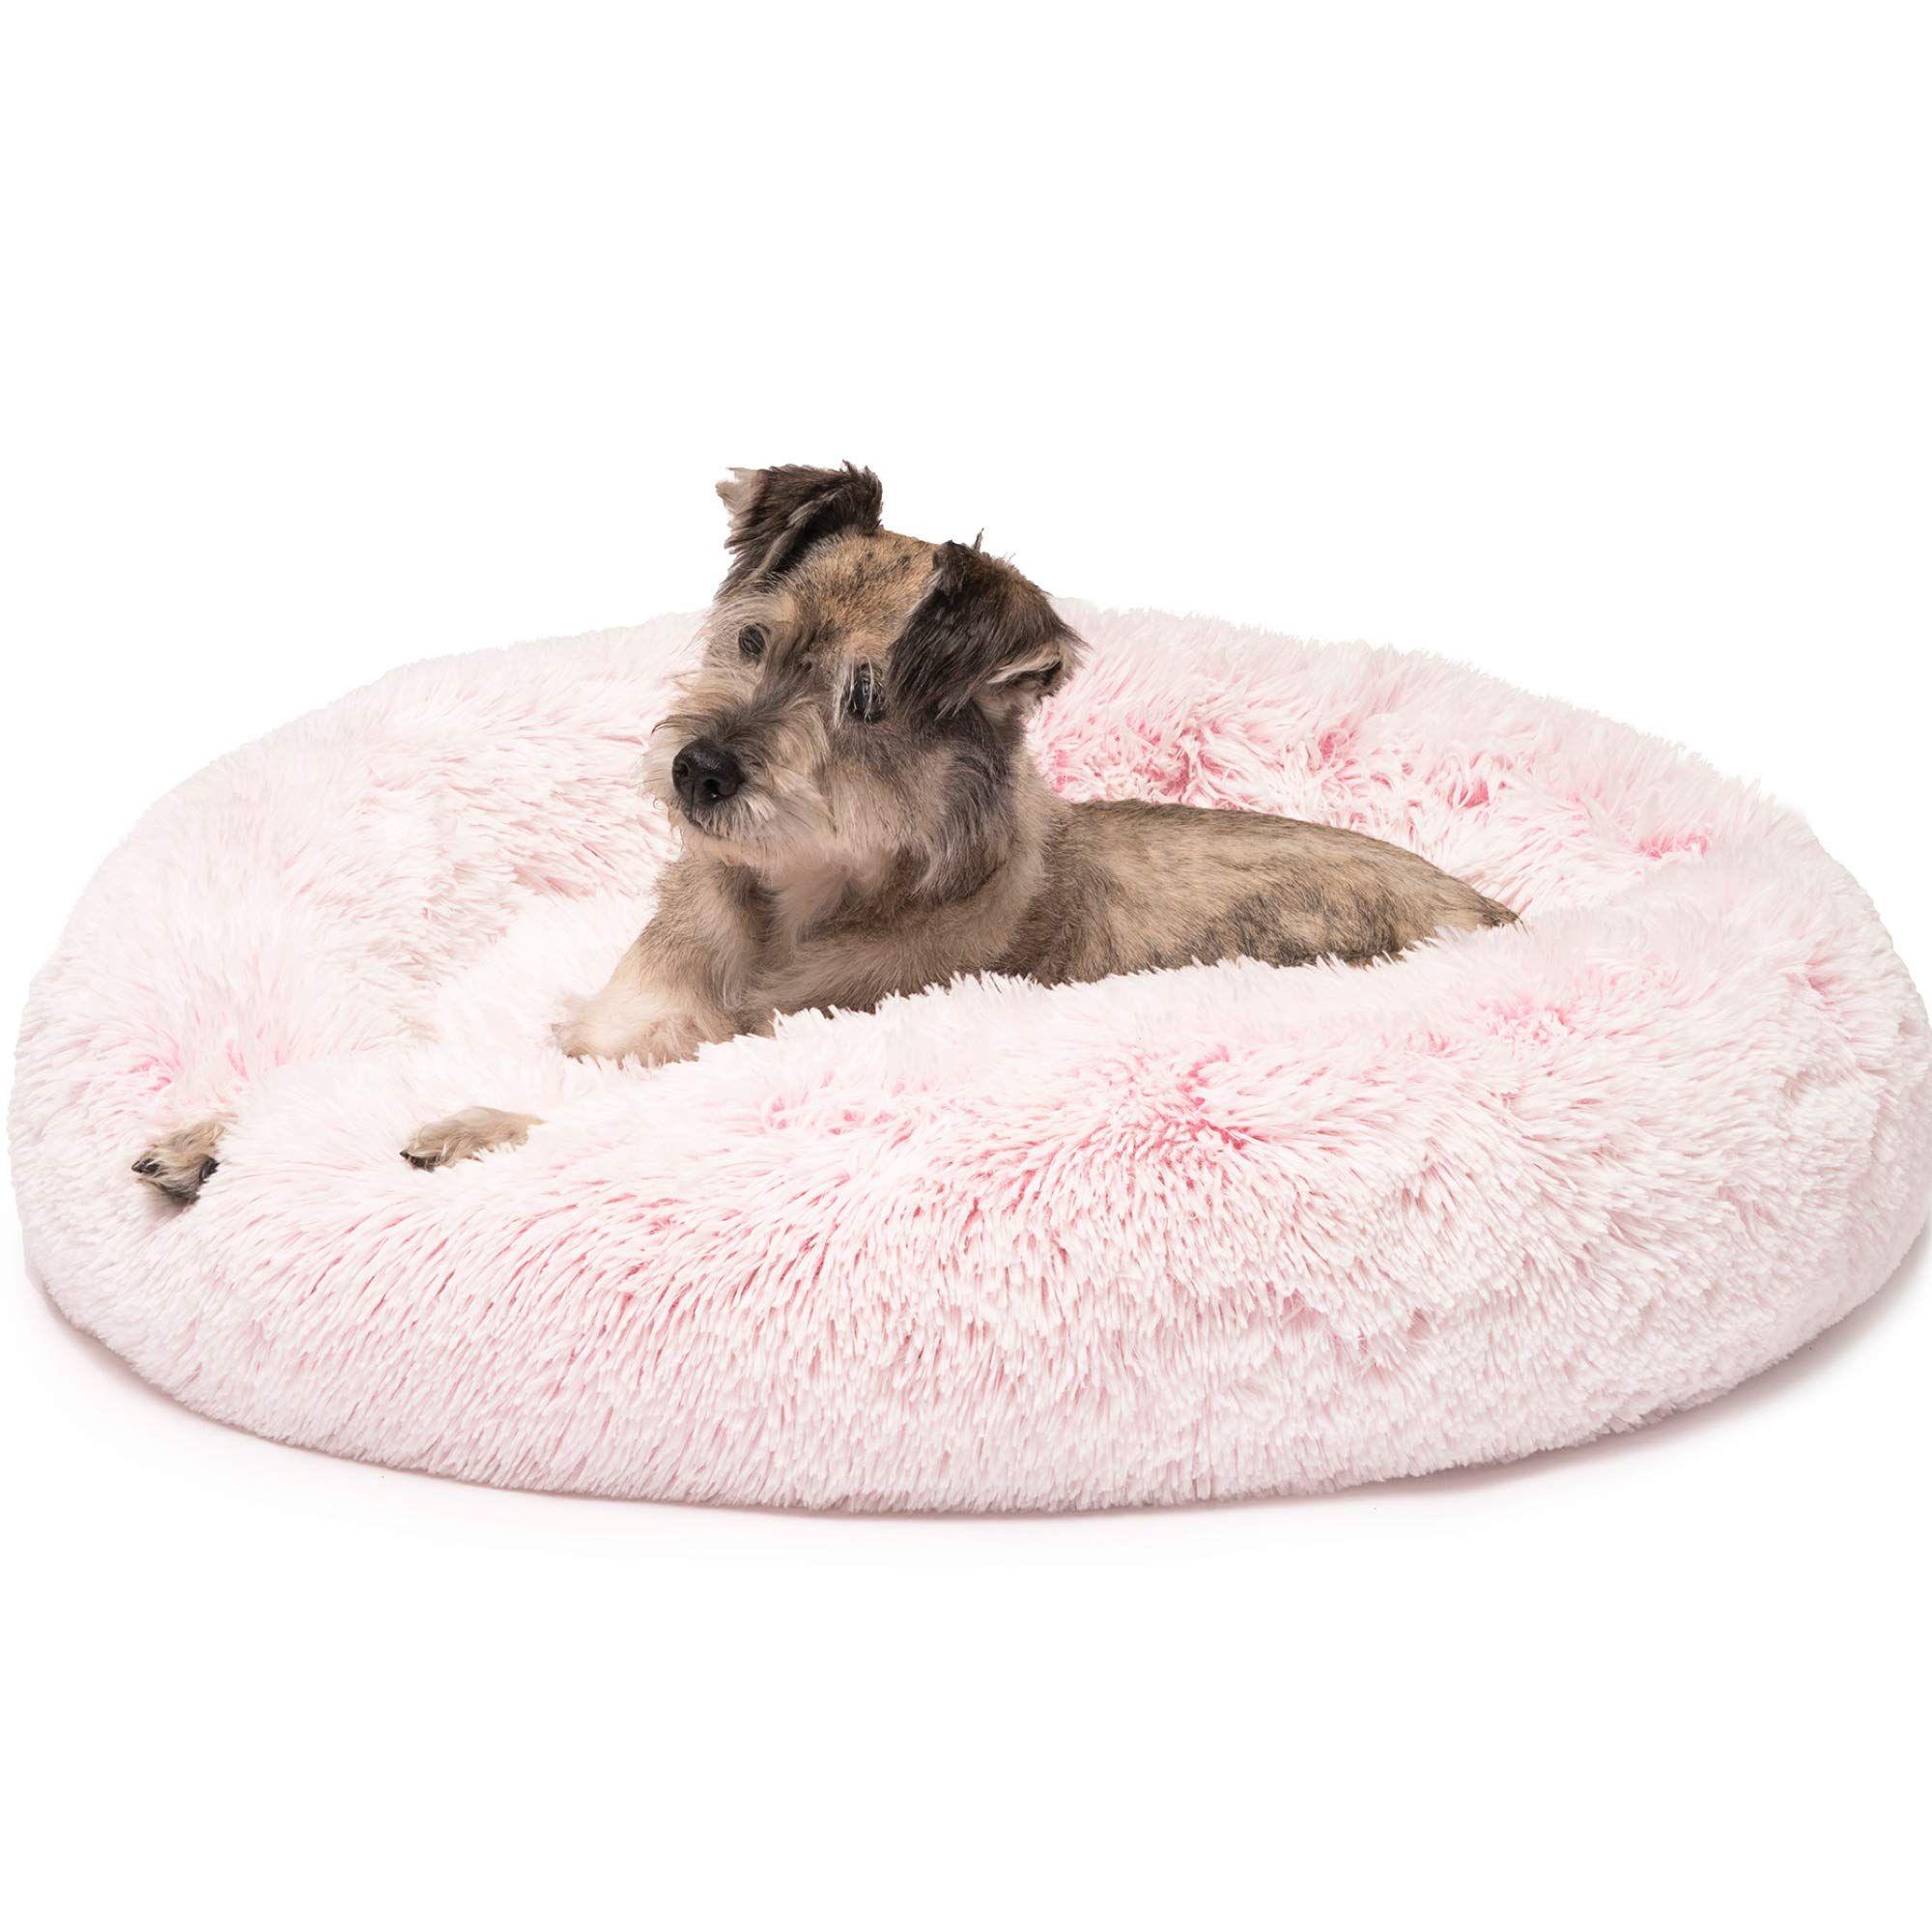 Friends Forever Fluffy Pink Dog Bed For Pet Comfy You Can Find More Details By Visiting The Image Link Pink Dog Beds Orthopedic Dog Bed Faux Fur Dog Beds